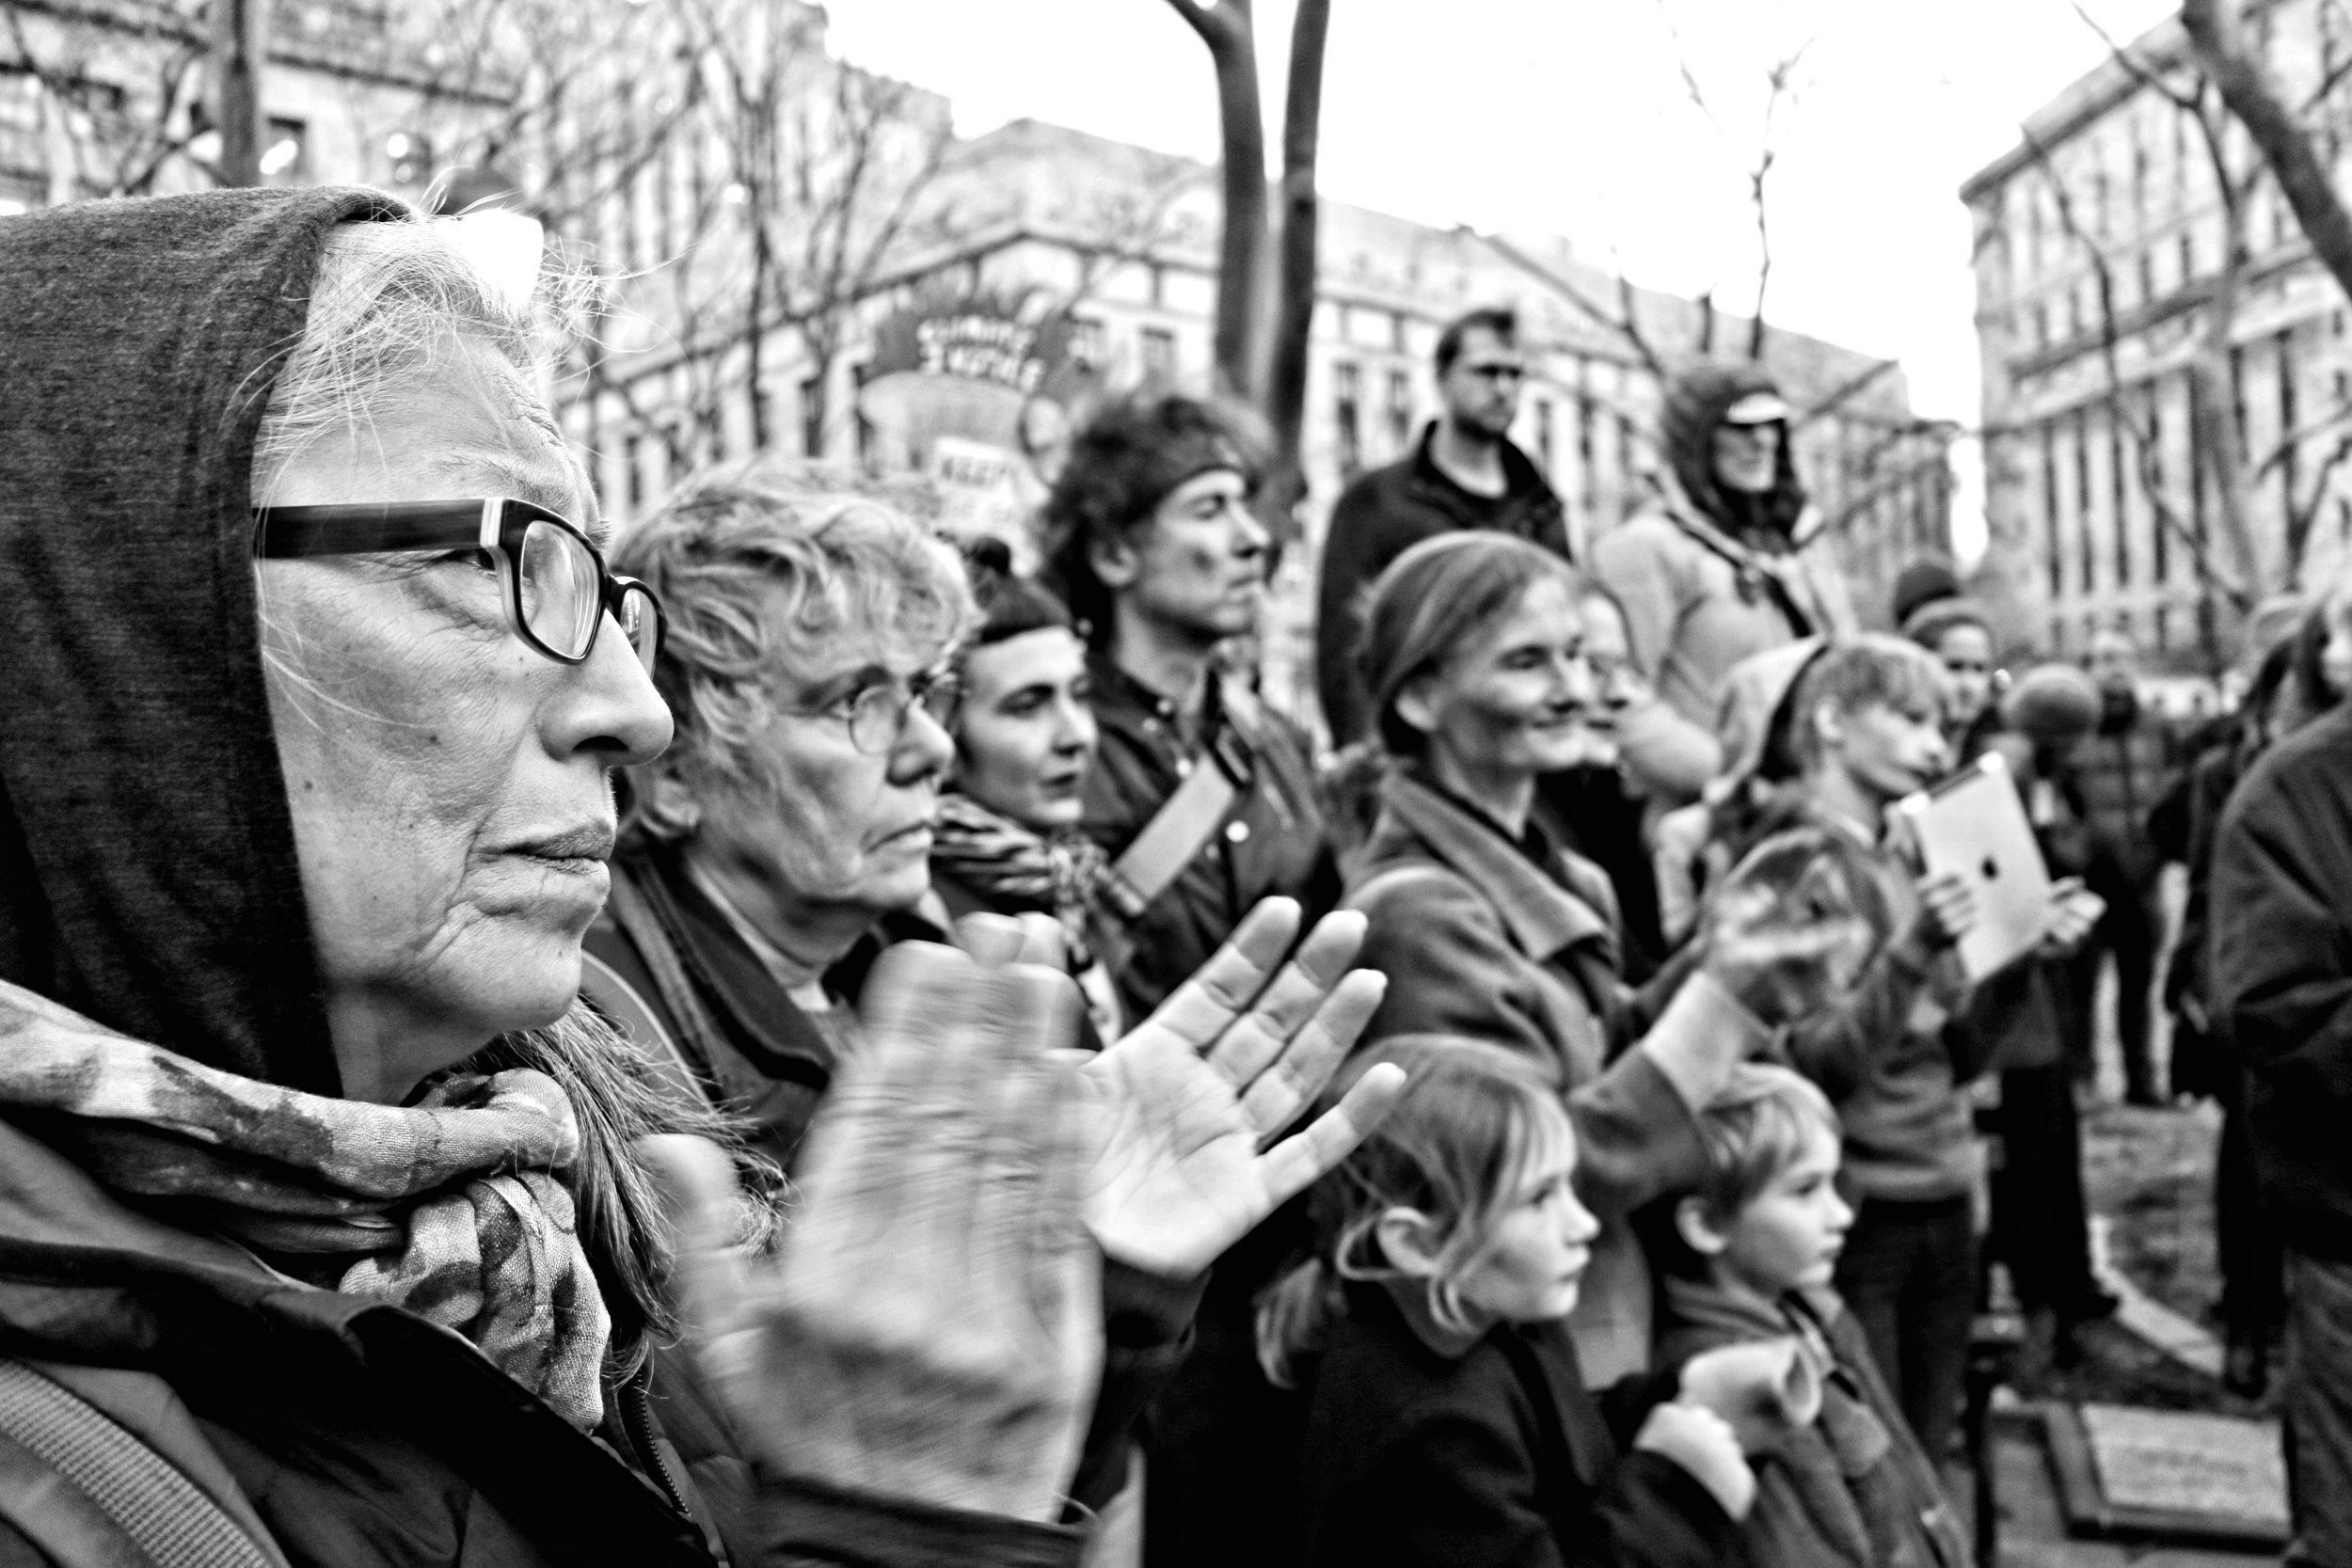 Emergency No DAPL Protest, Foley Square, February 8th, 2017